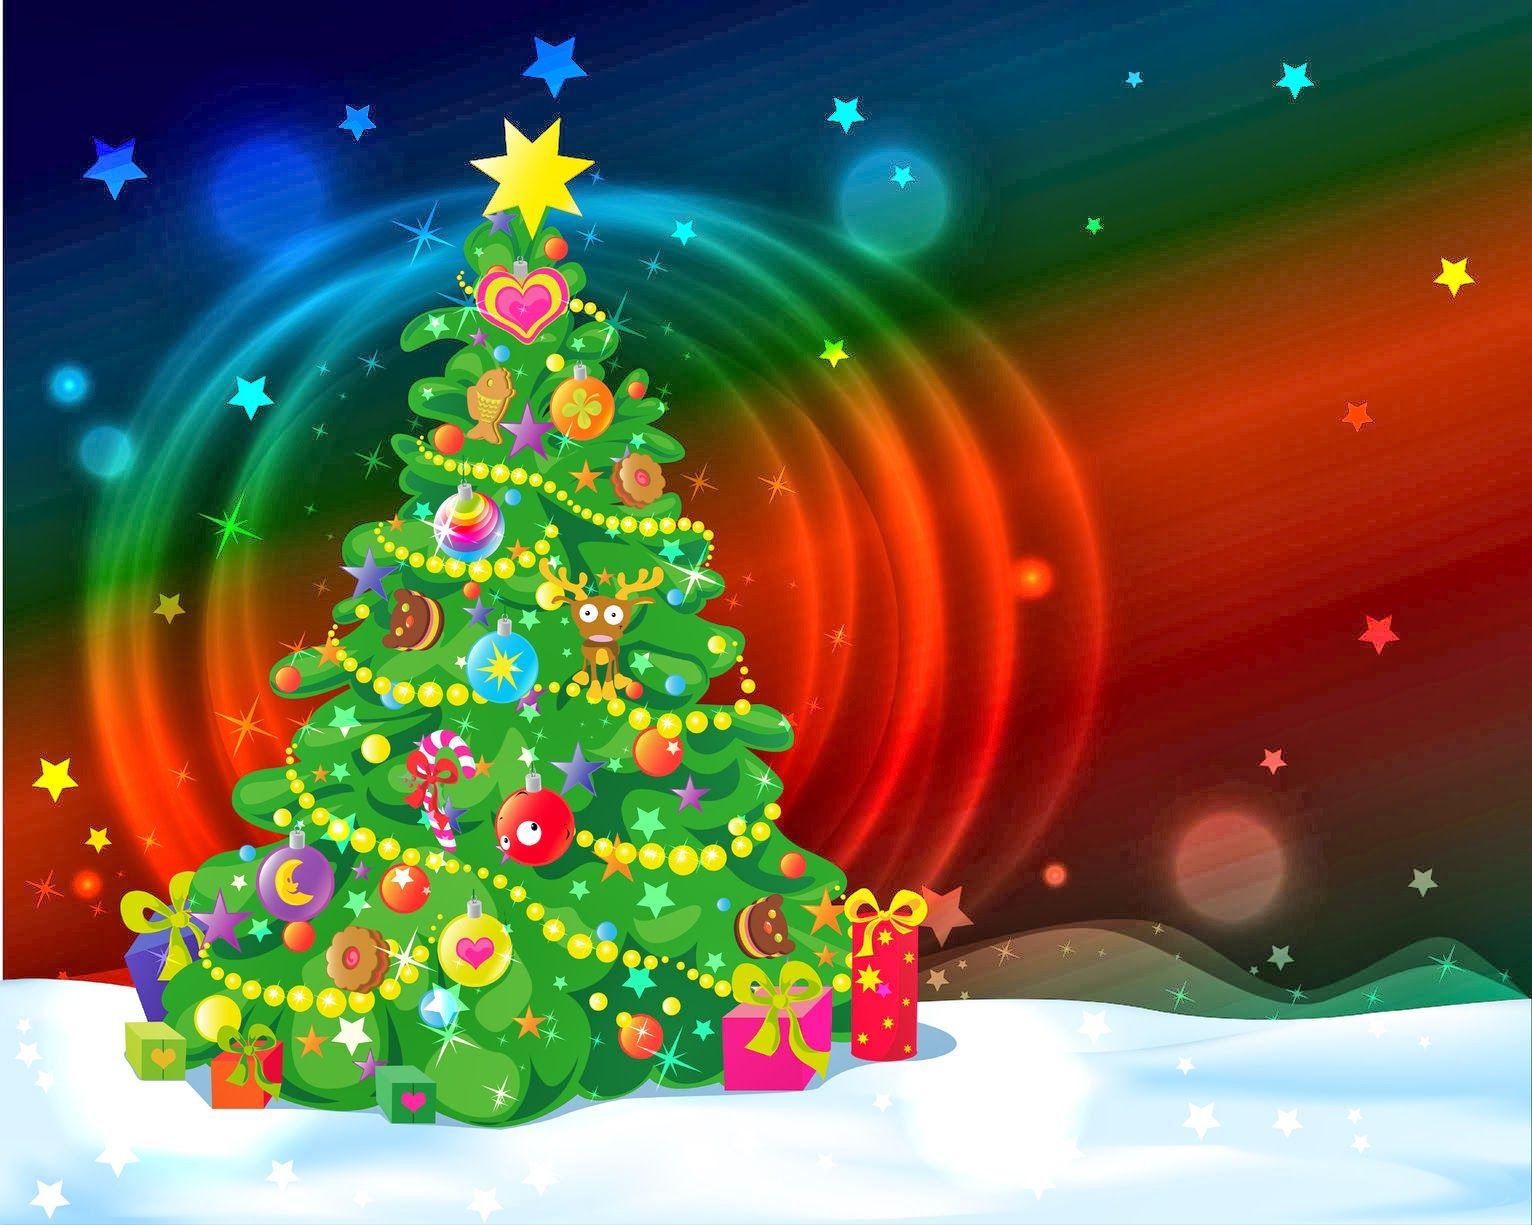 Fondos Navidad Animados: FrasesparatuMuro.com: Fondos Navideños Para Pantalla